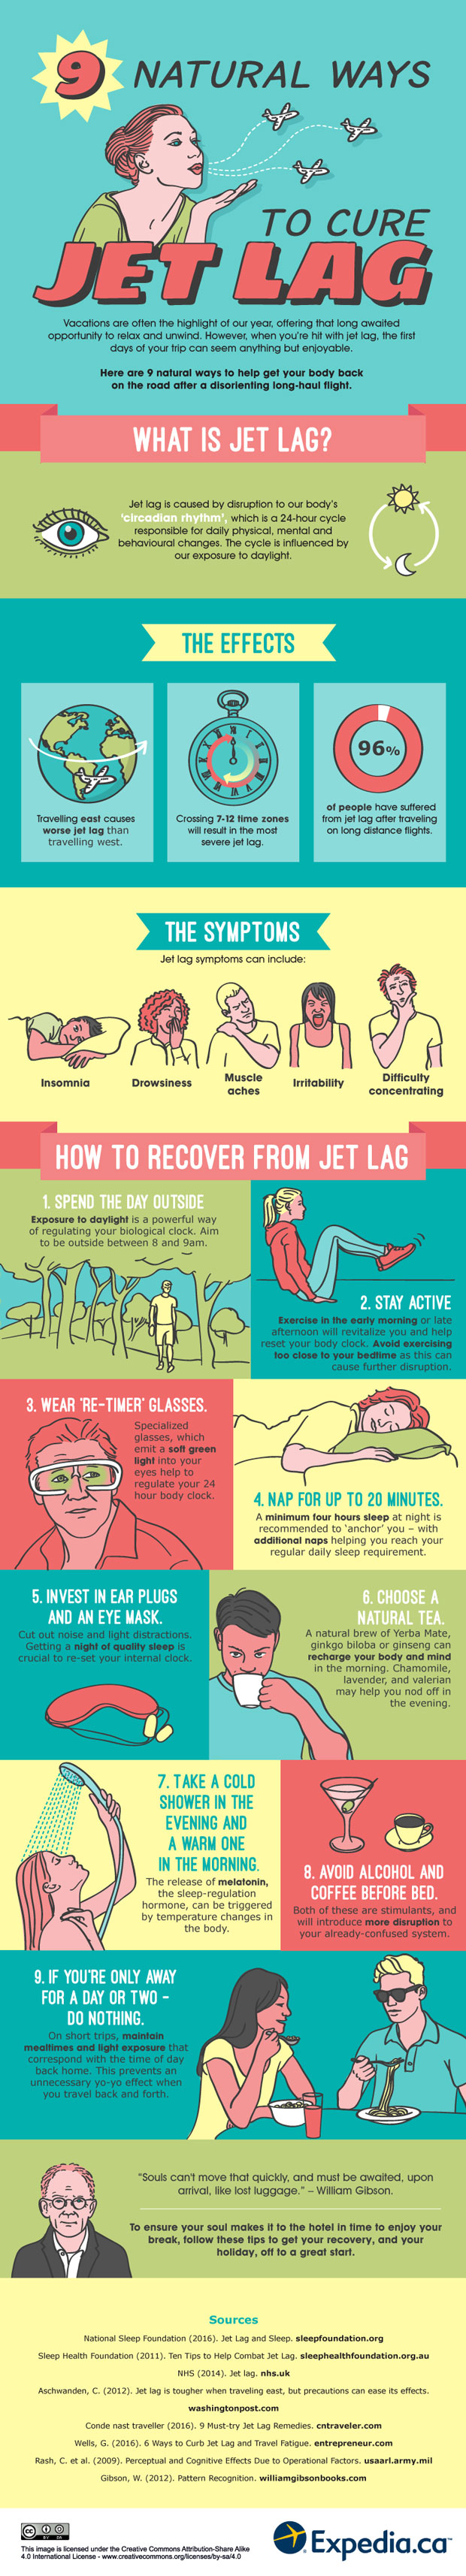 jet-lag-cures